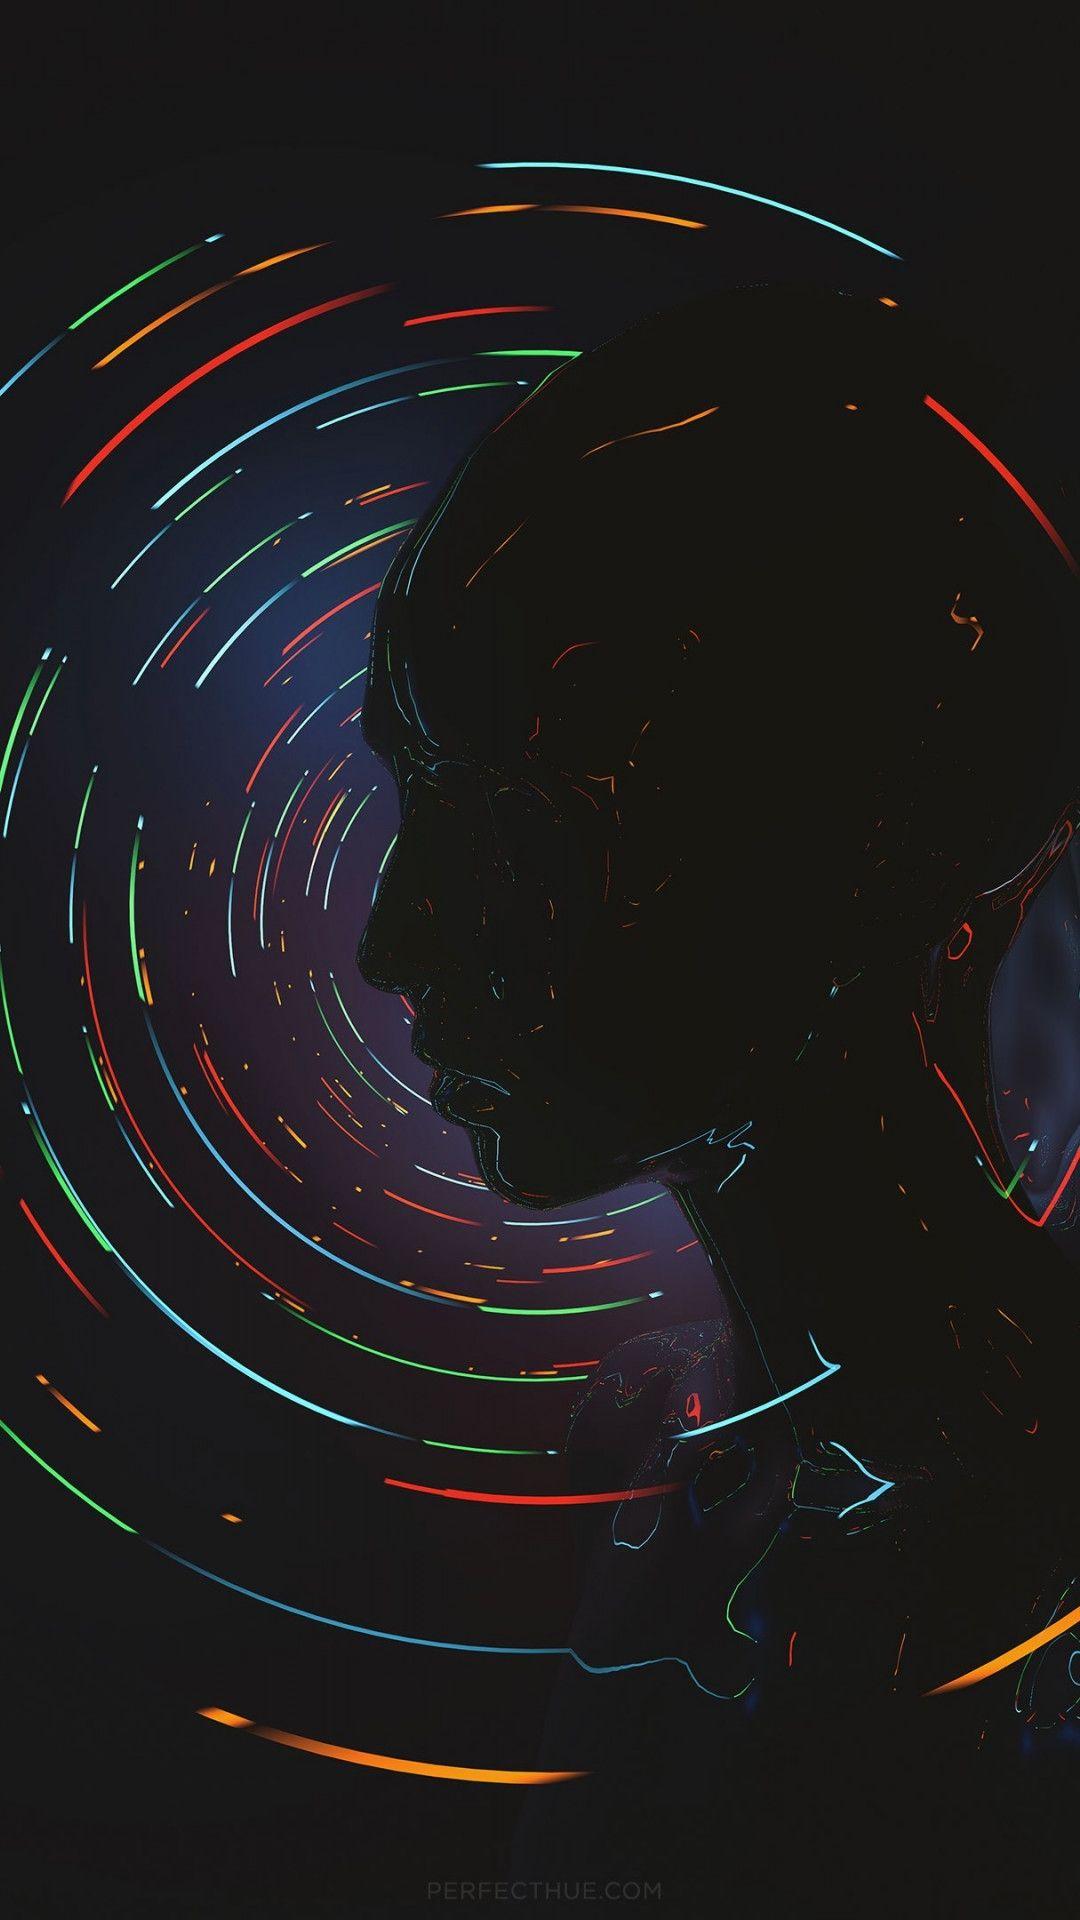 Abstract Galaxy s9 wallpaper